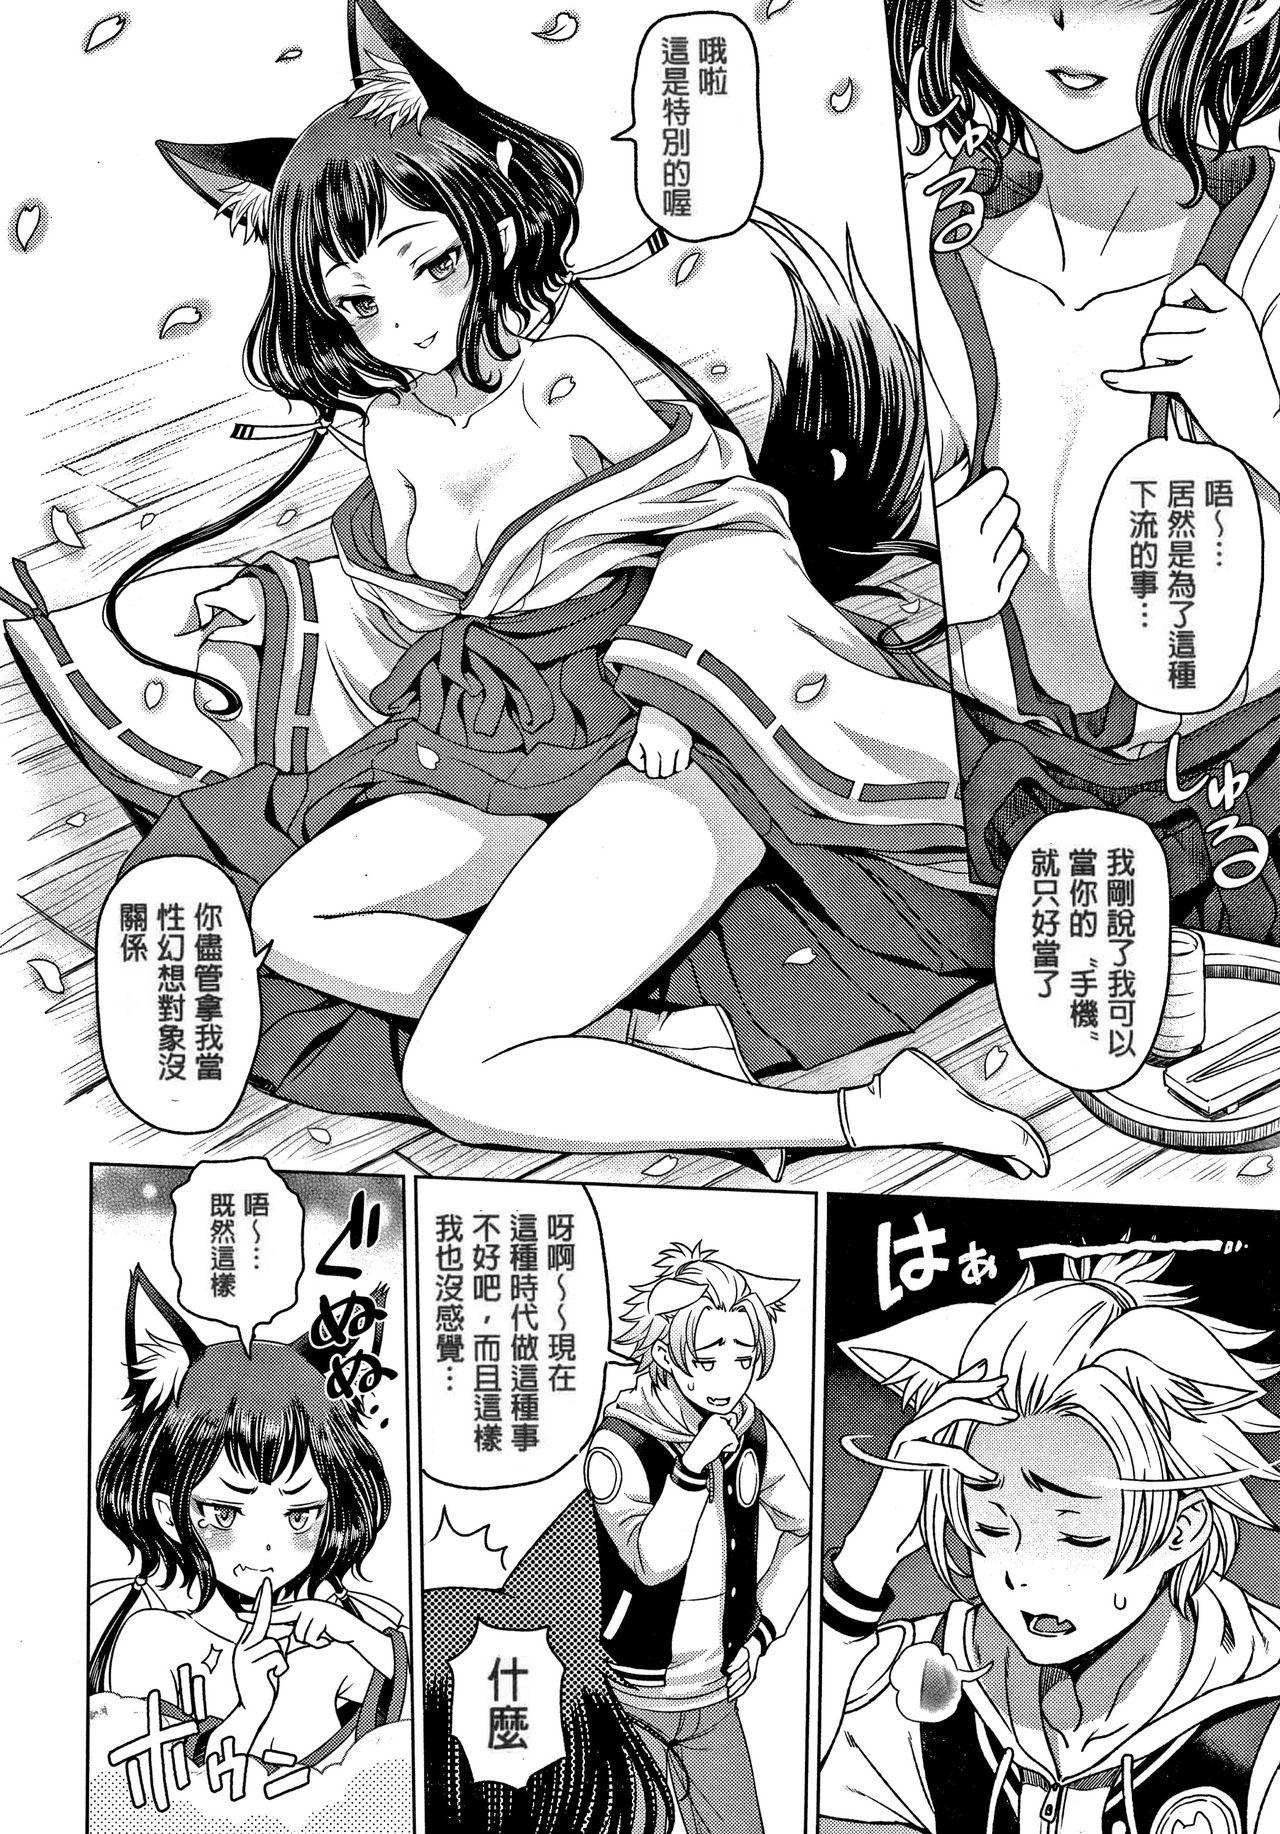 Fushimizawa Tamako no Baai 3